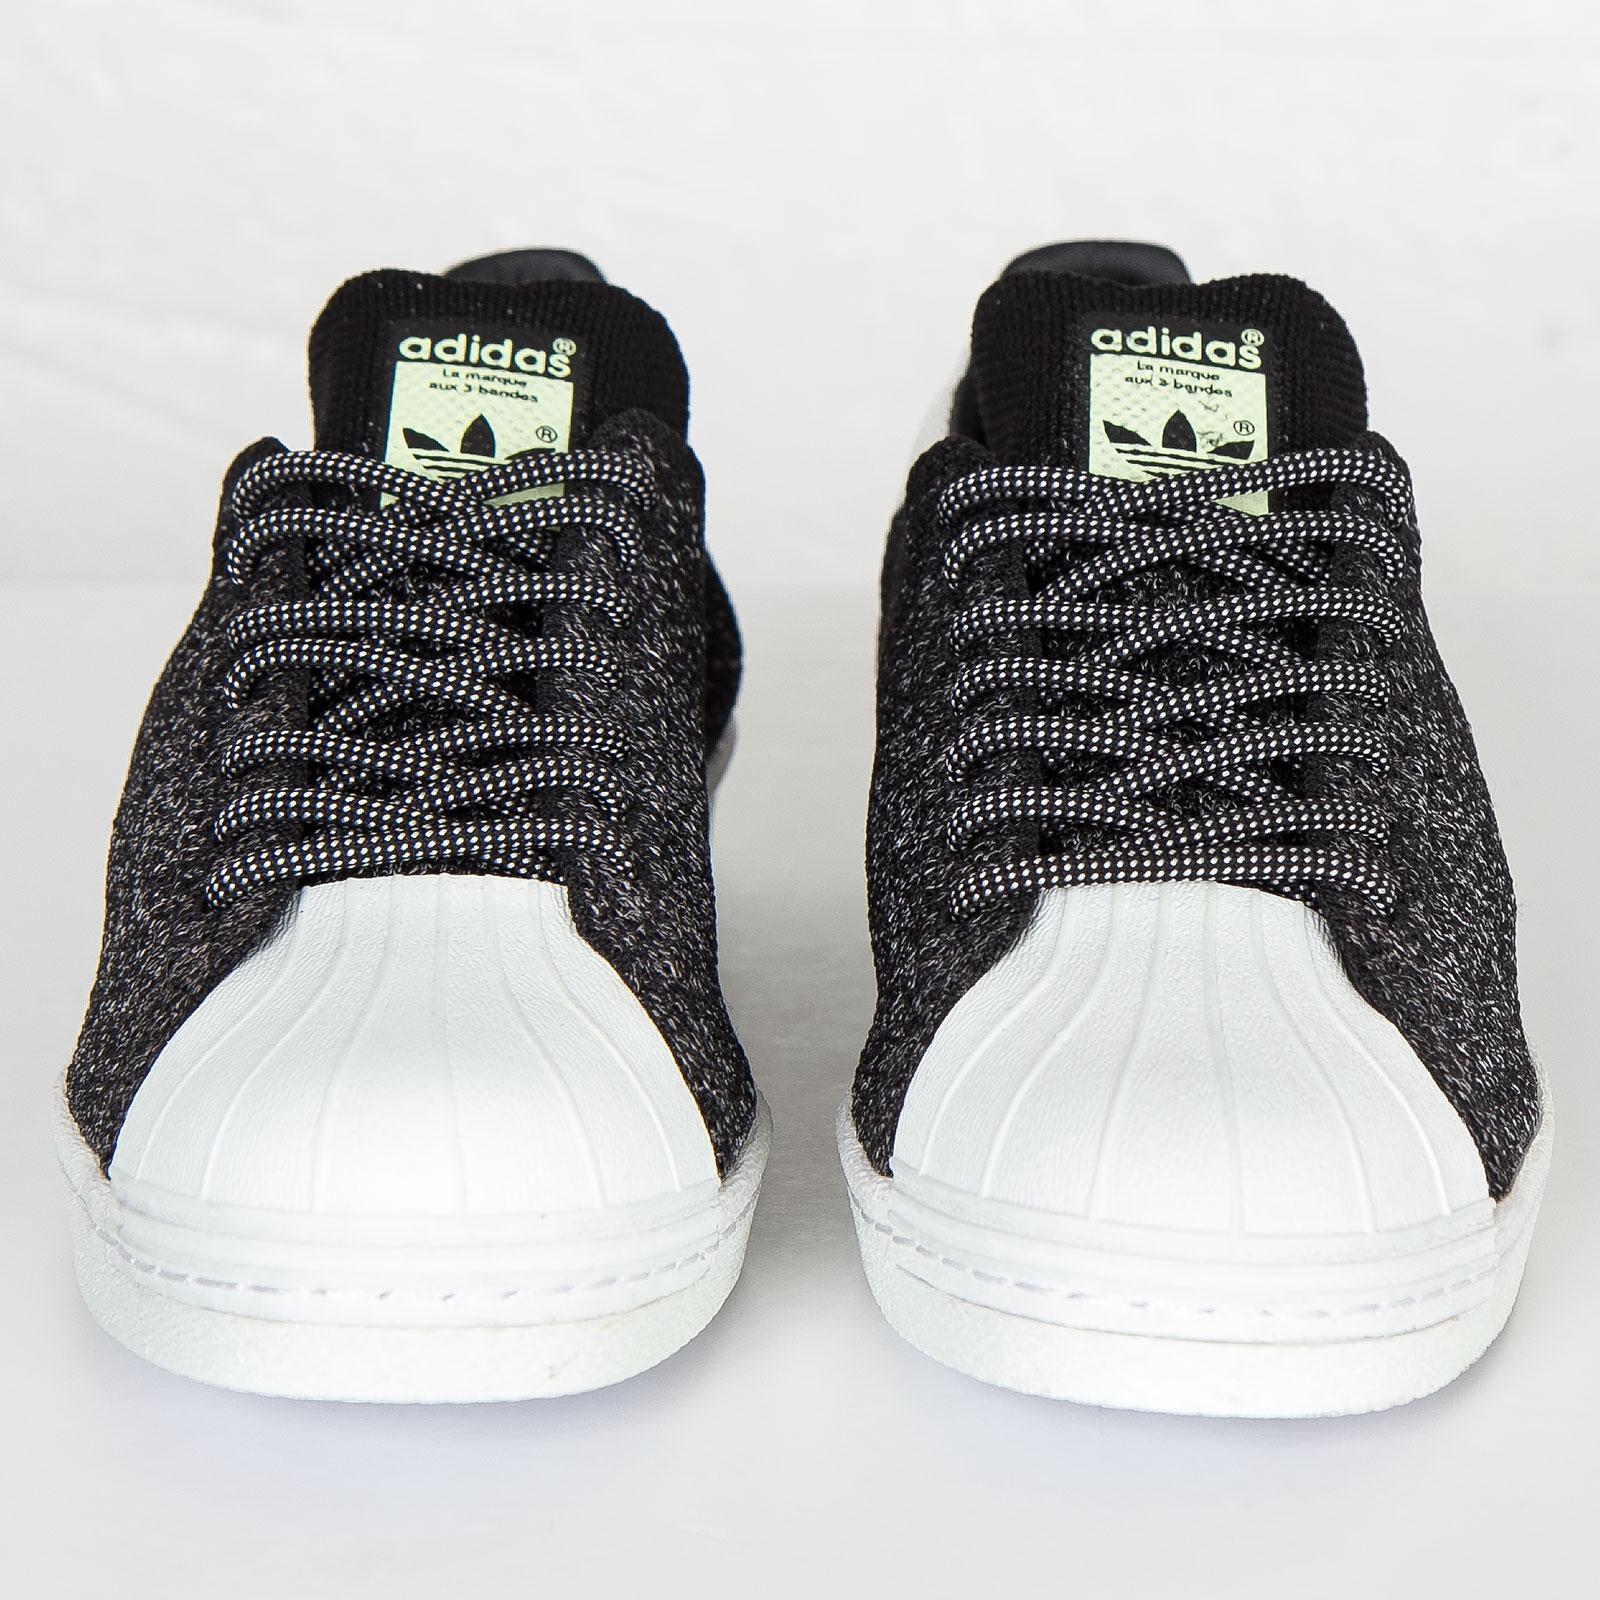 adidas Superstar 80s Primeknit AS - S32029 - SNS   sneakers ...